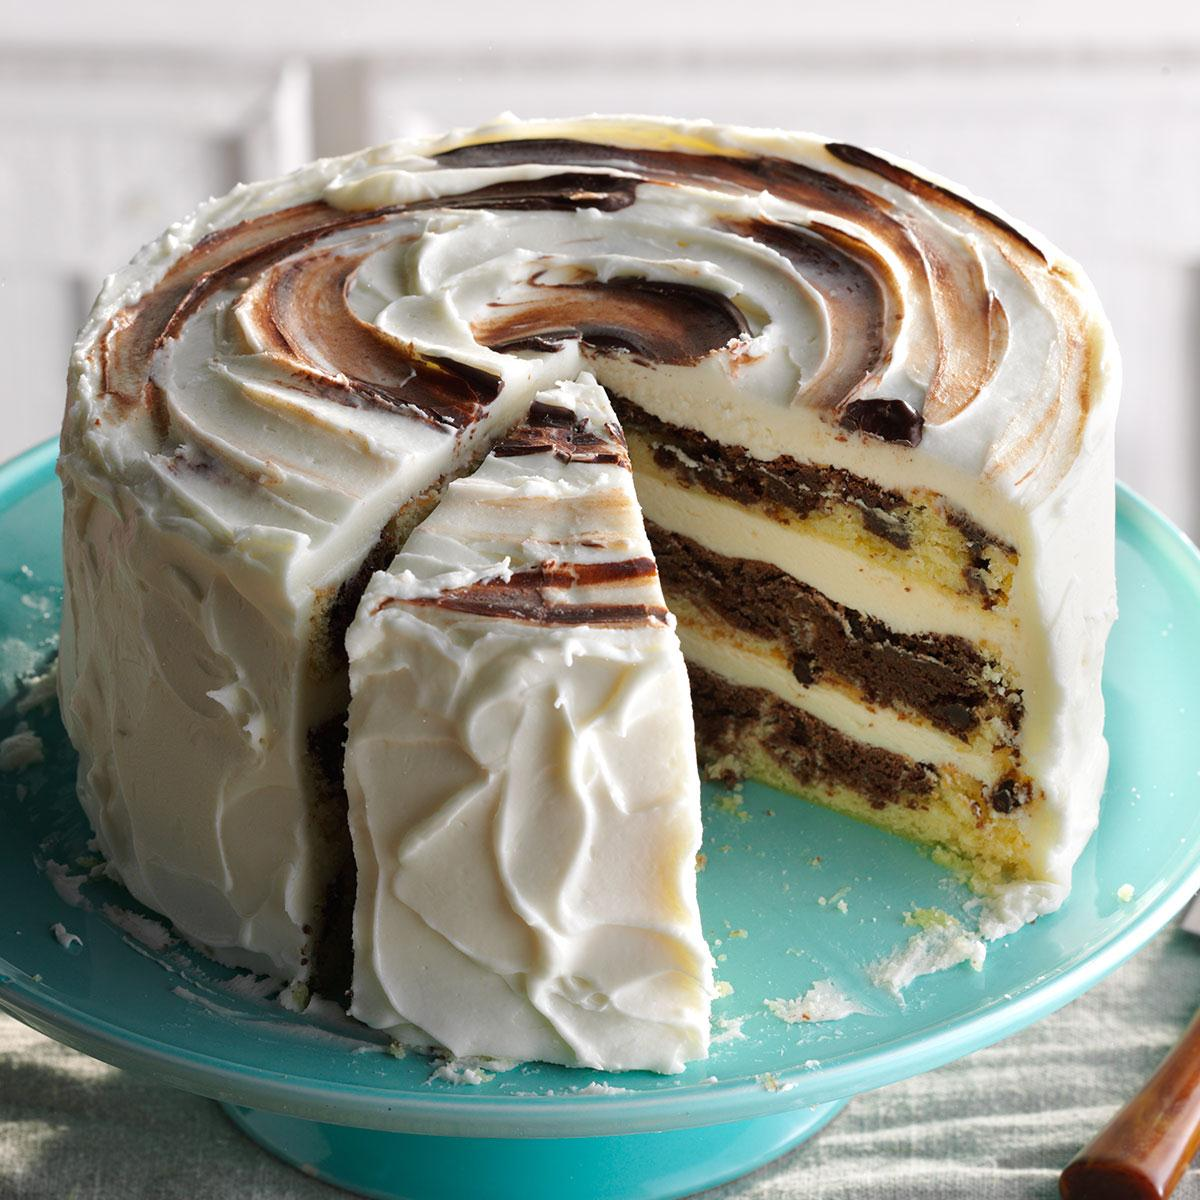 Yummy Cakes Make Home